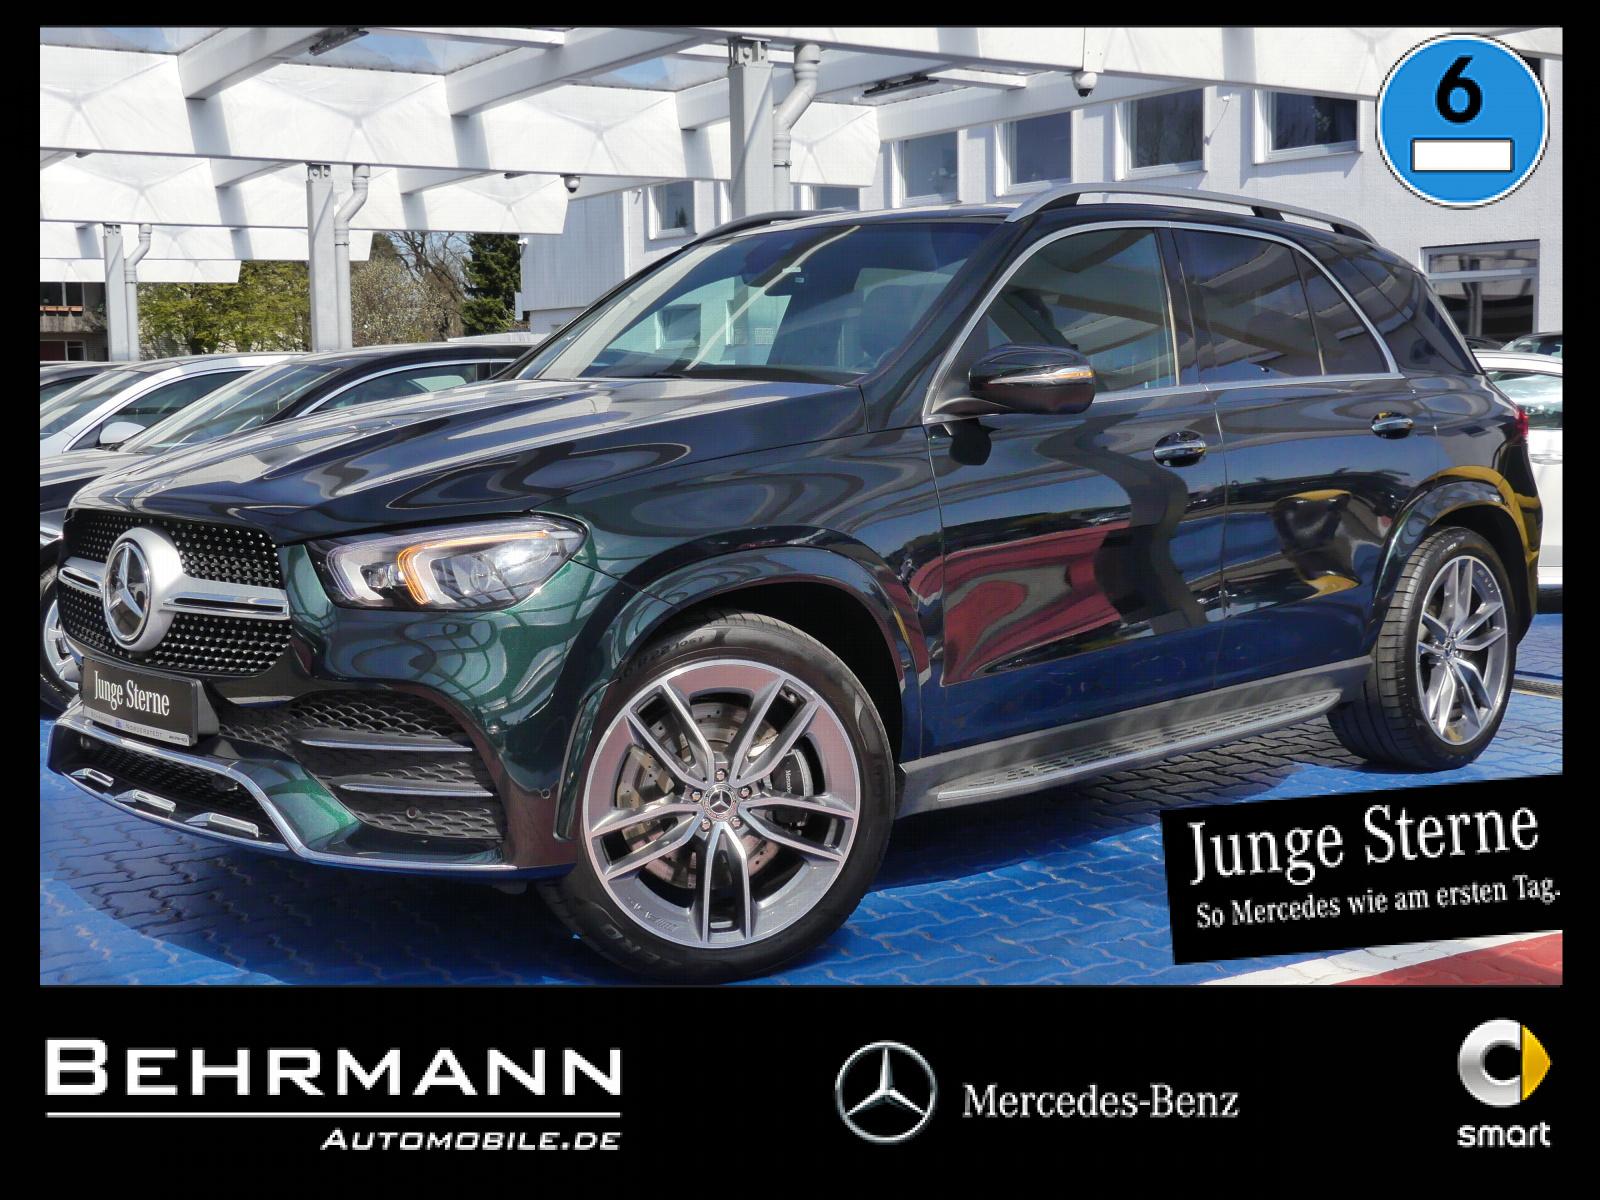 Mercedes-Benz GLE 450 AMG 4M Panorama+AHK+360°Kamera+Burmester, Jahr 2020, Benzin